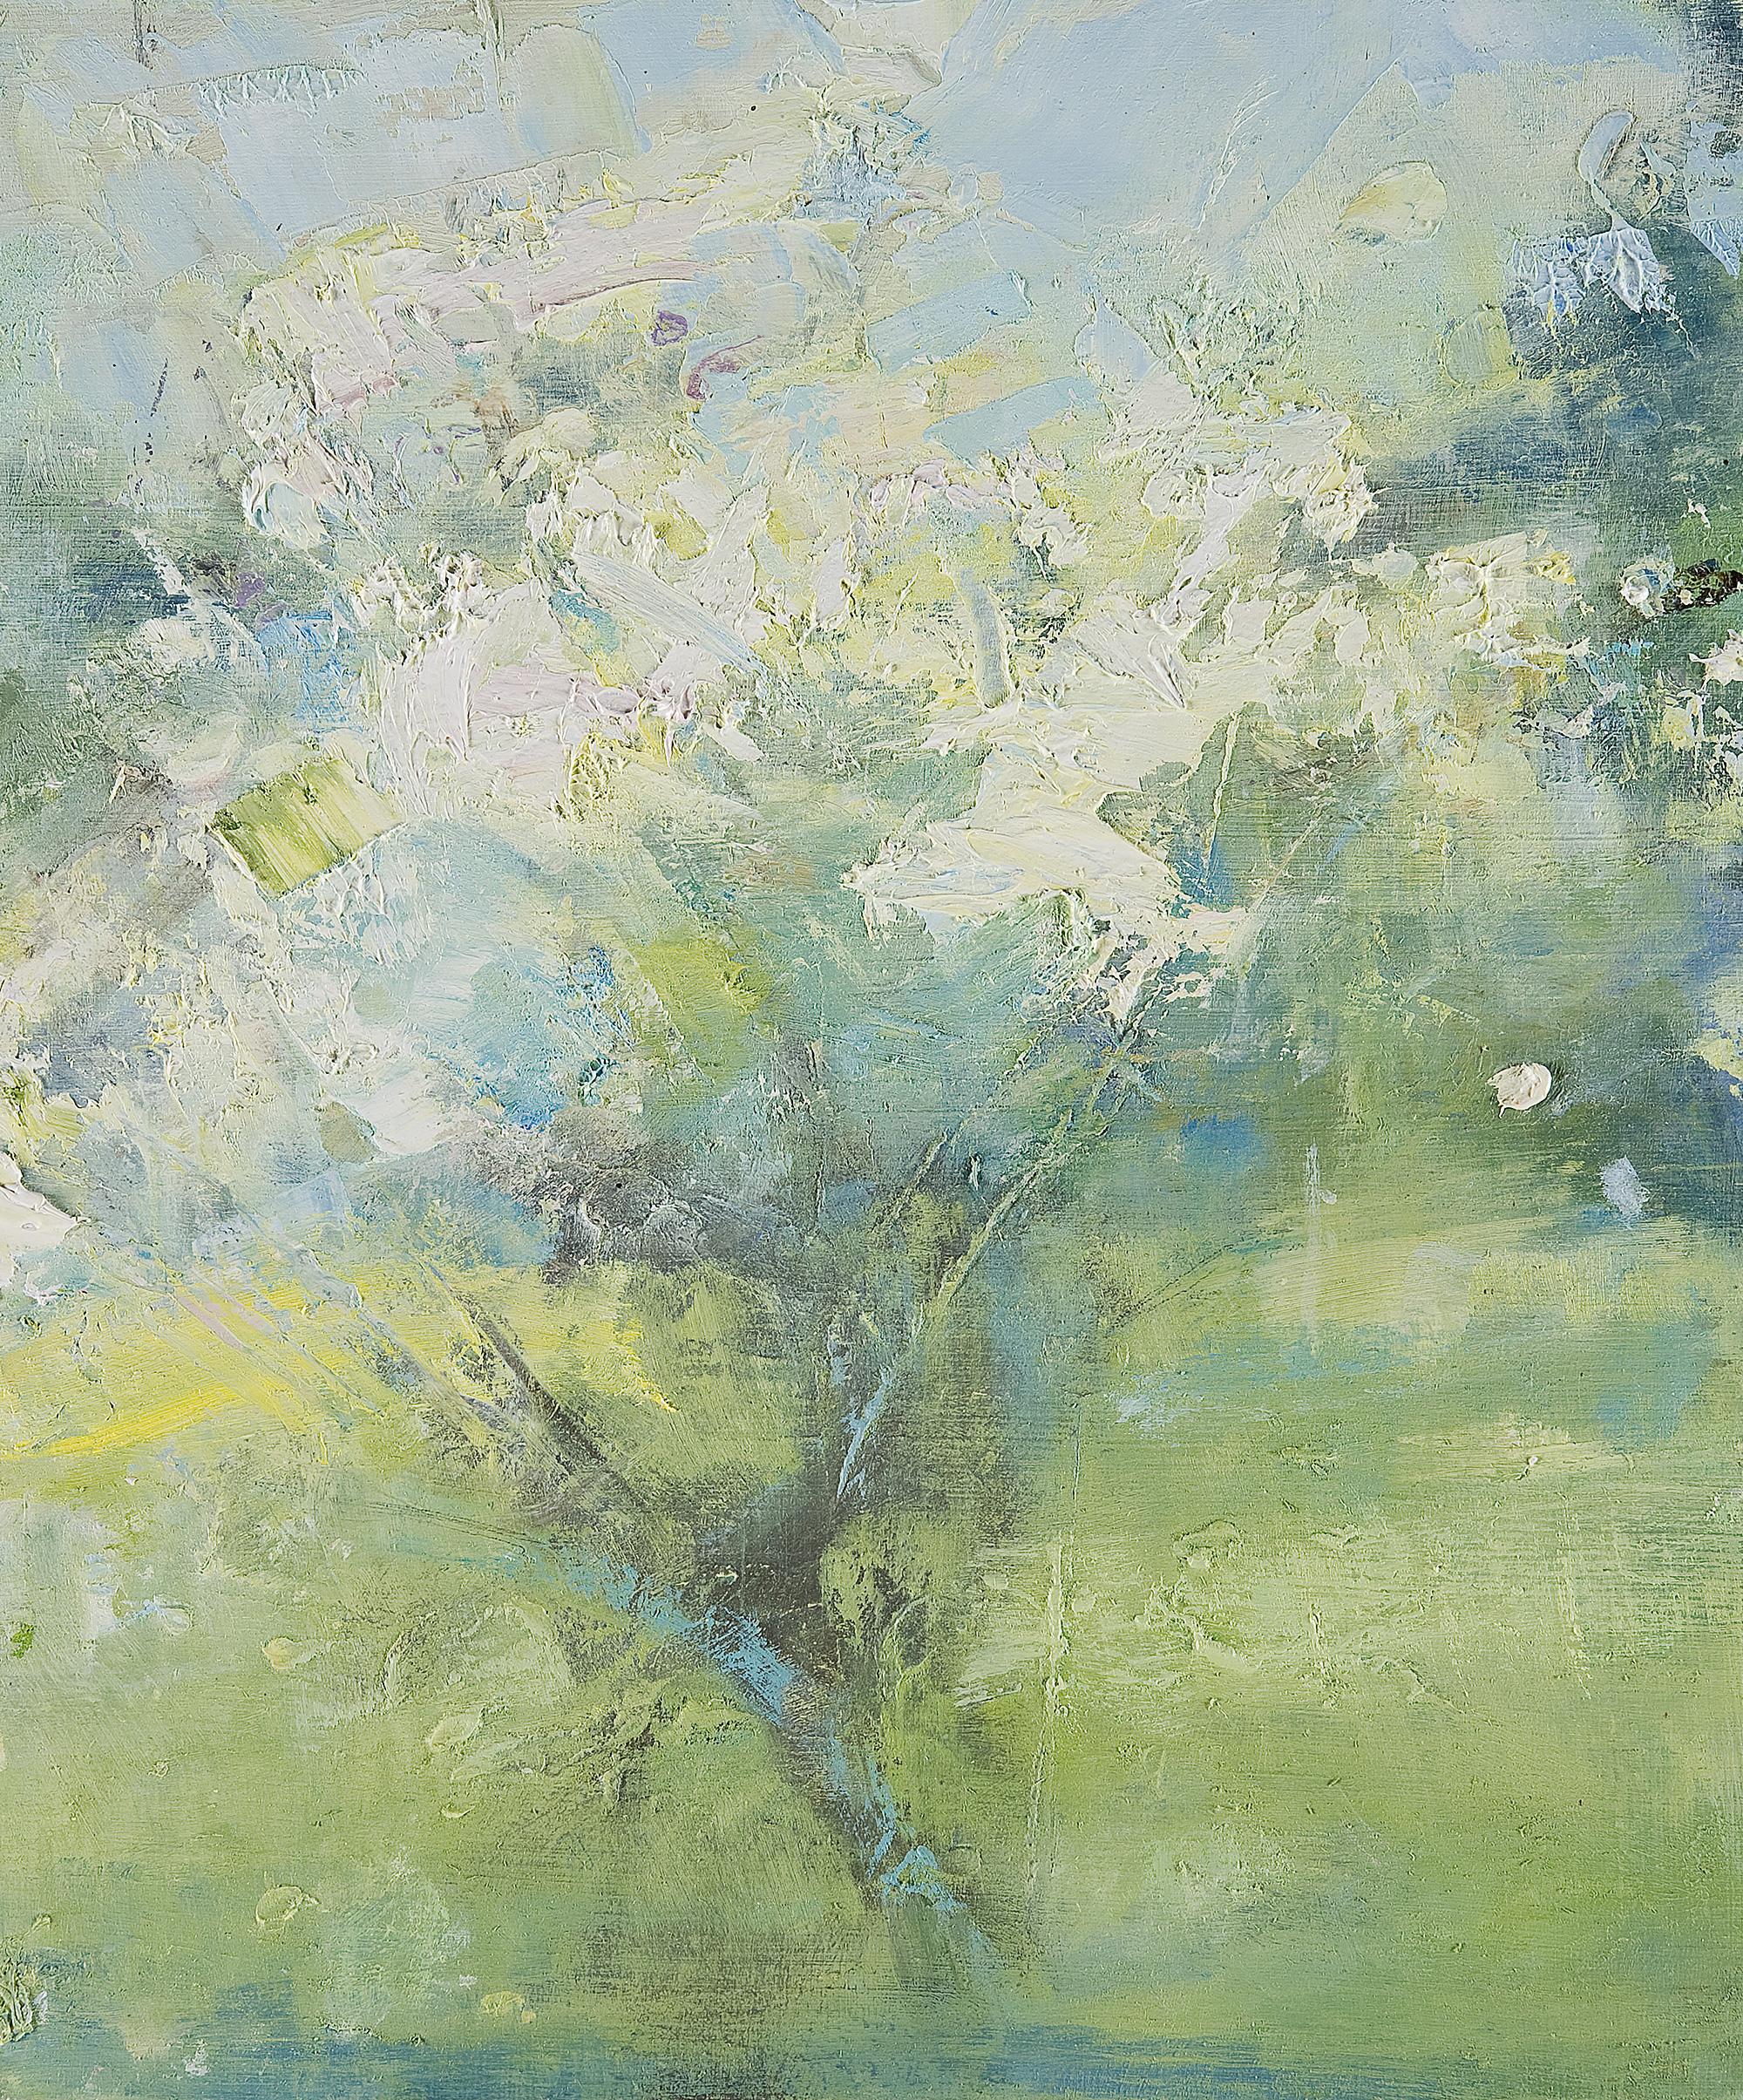 Study in a Cornish Garden III (Triptych). Oil on board. 30 x 25cm. Oil on board. 30 x 25cm.  Sold